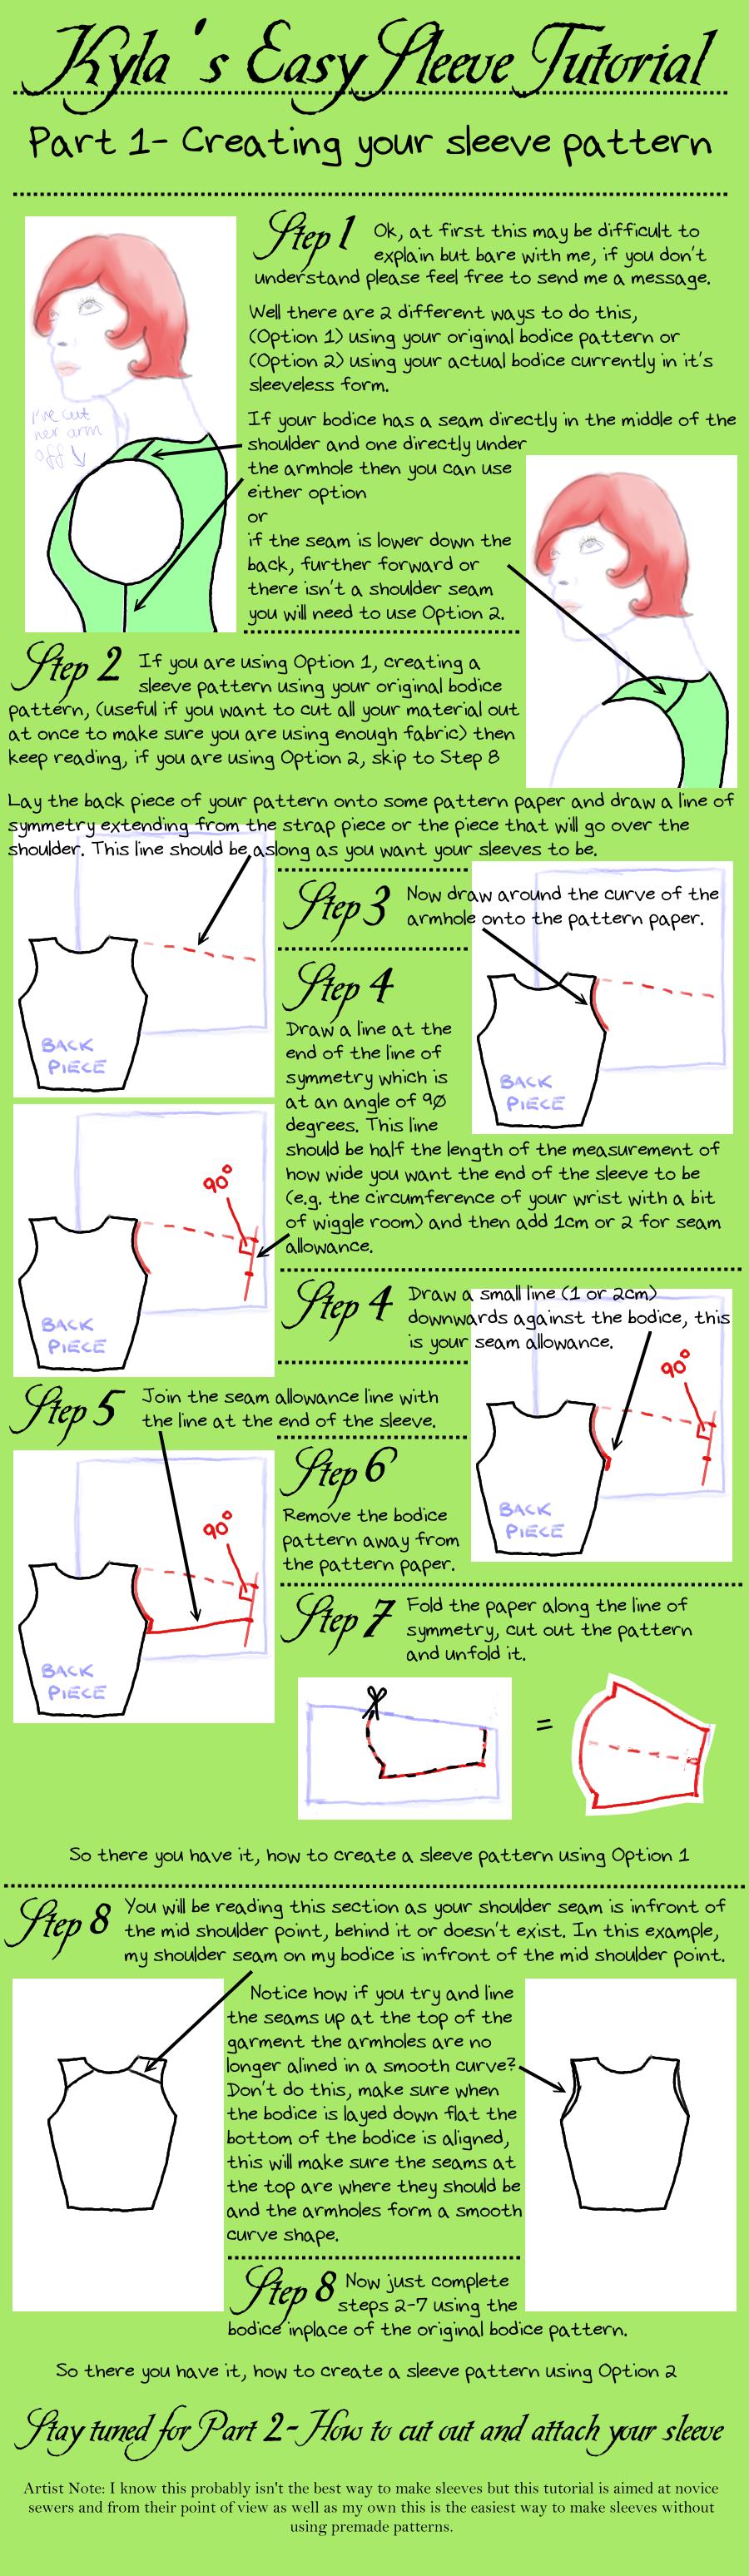 Easy Sleeve Tutorial by ScreamingInTheWoods.deviantart.com on ...